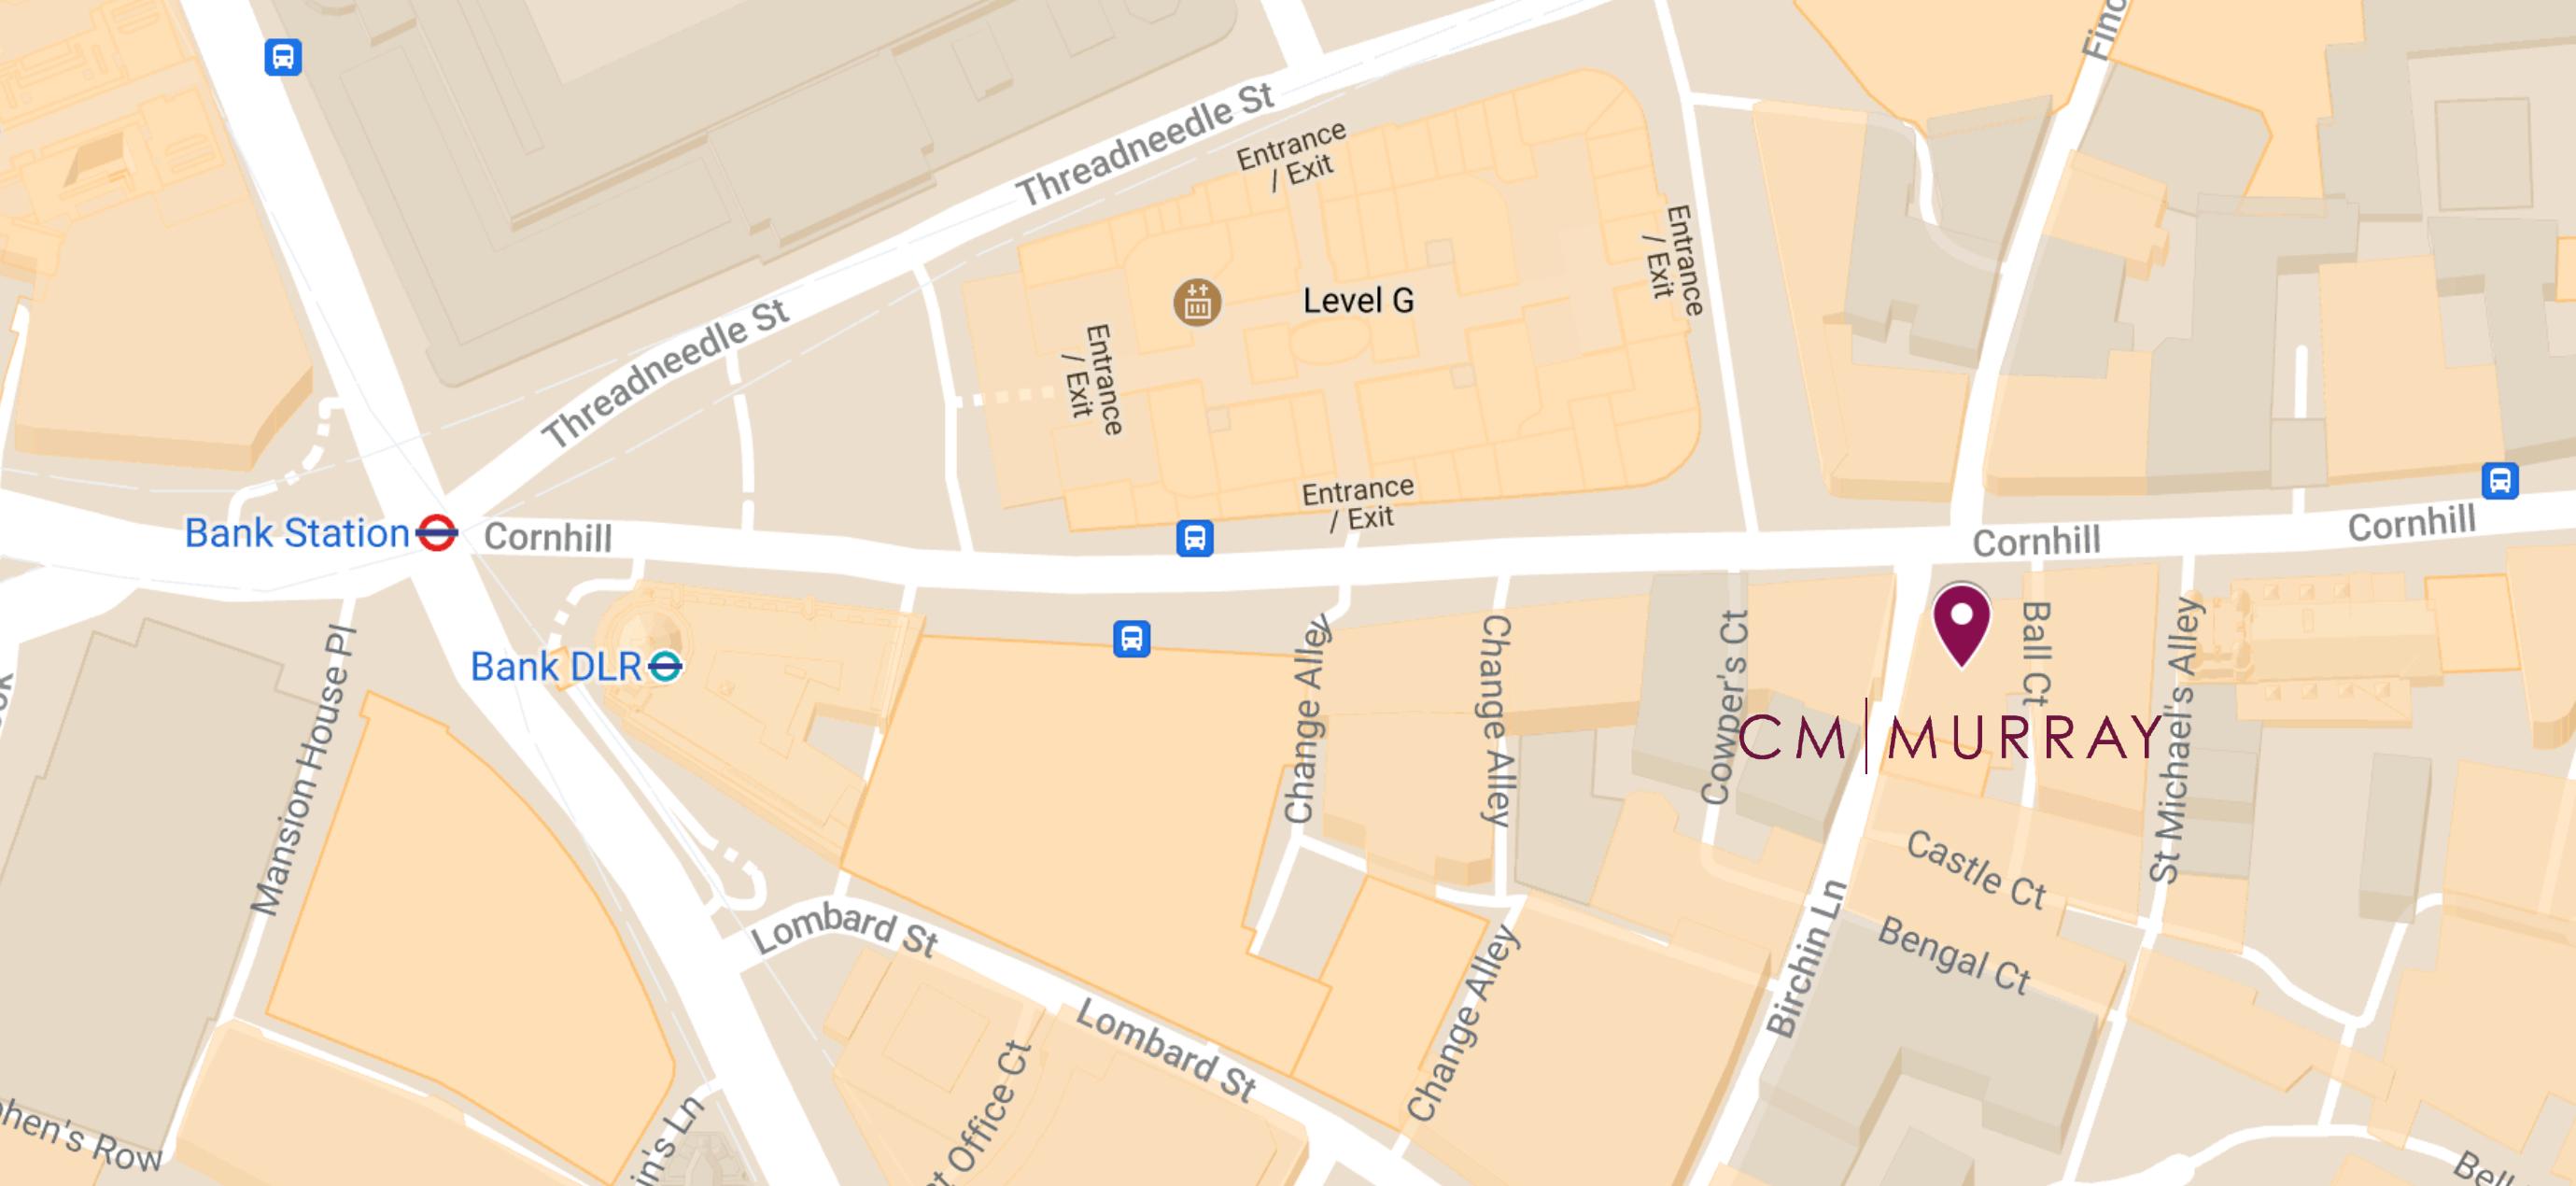 CM-Murray Map